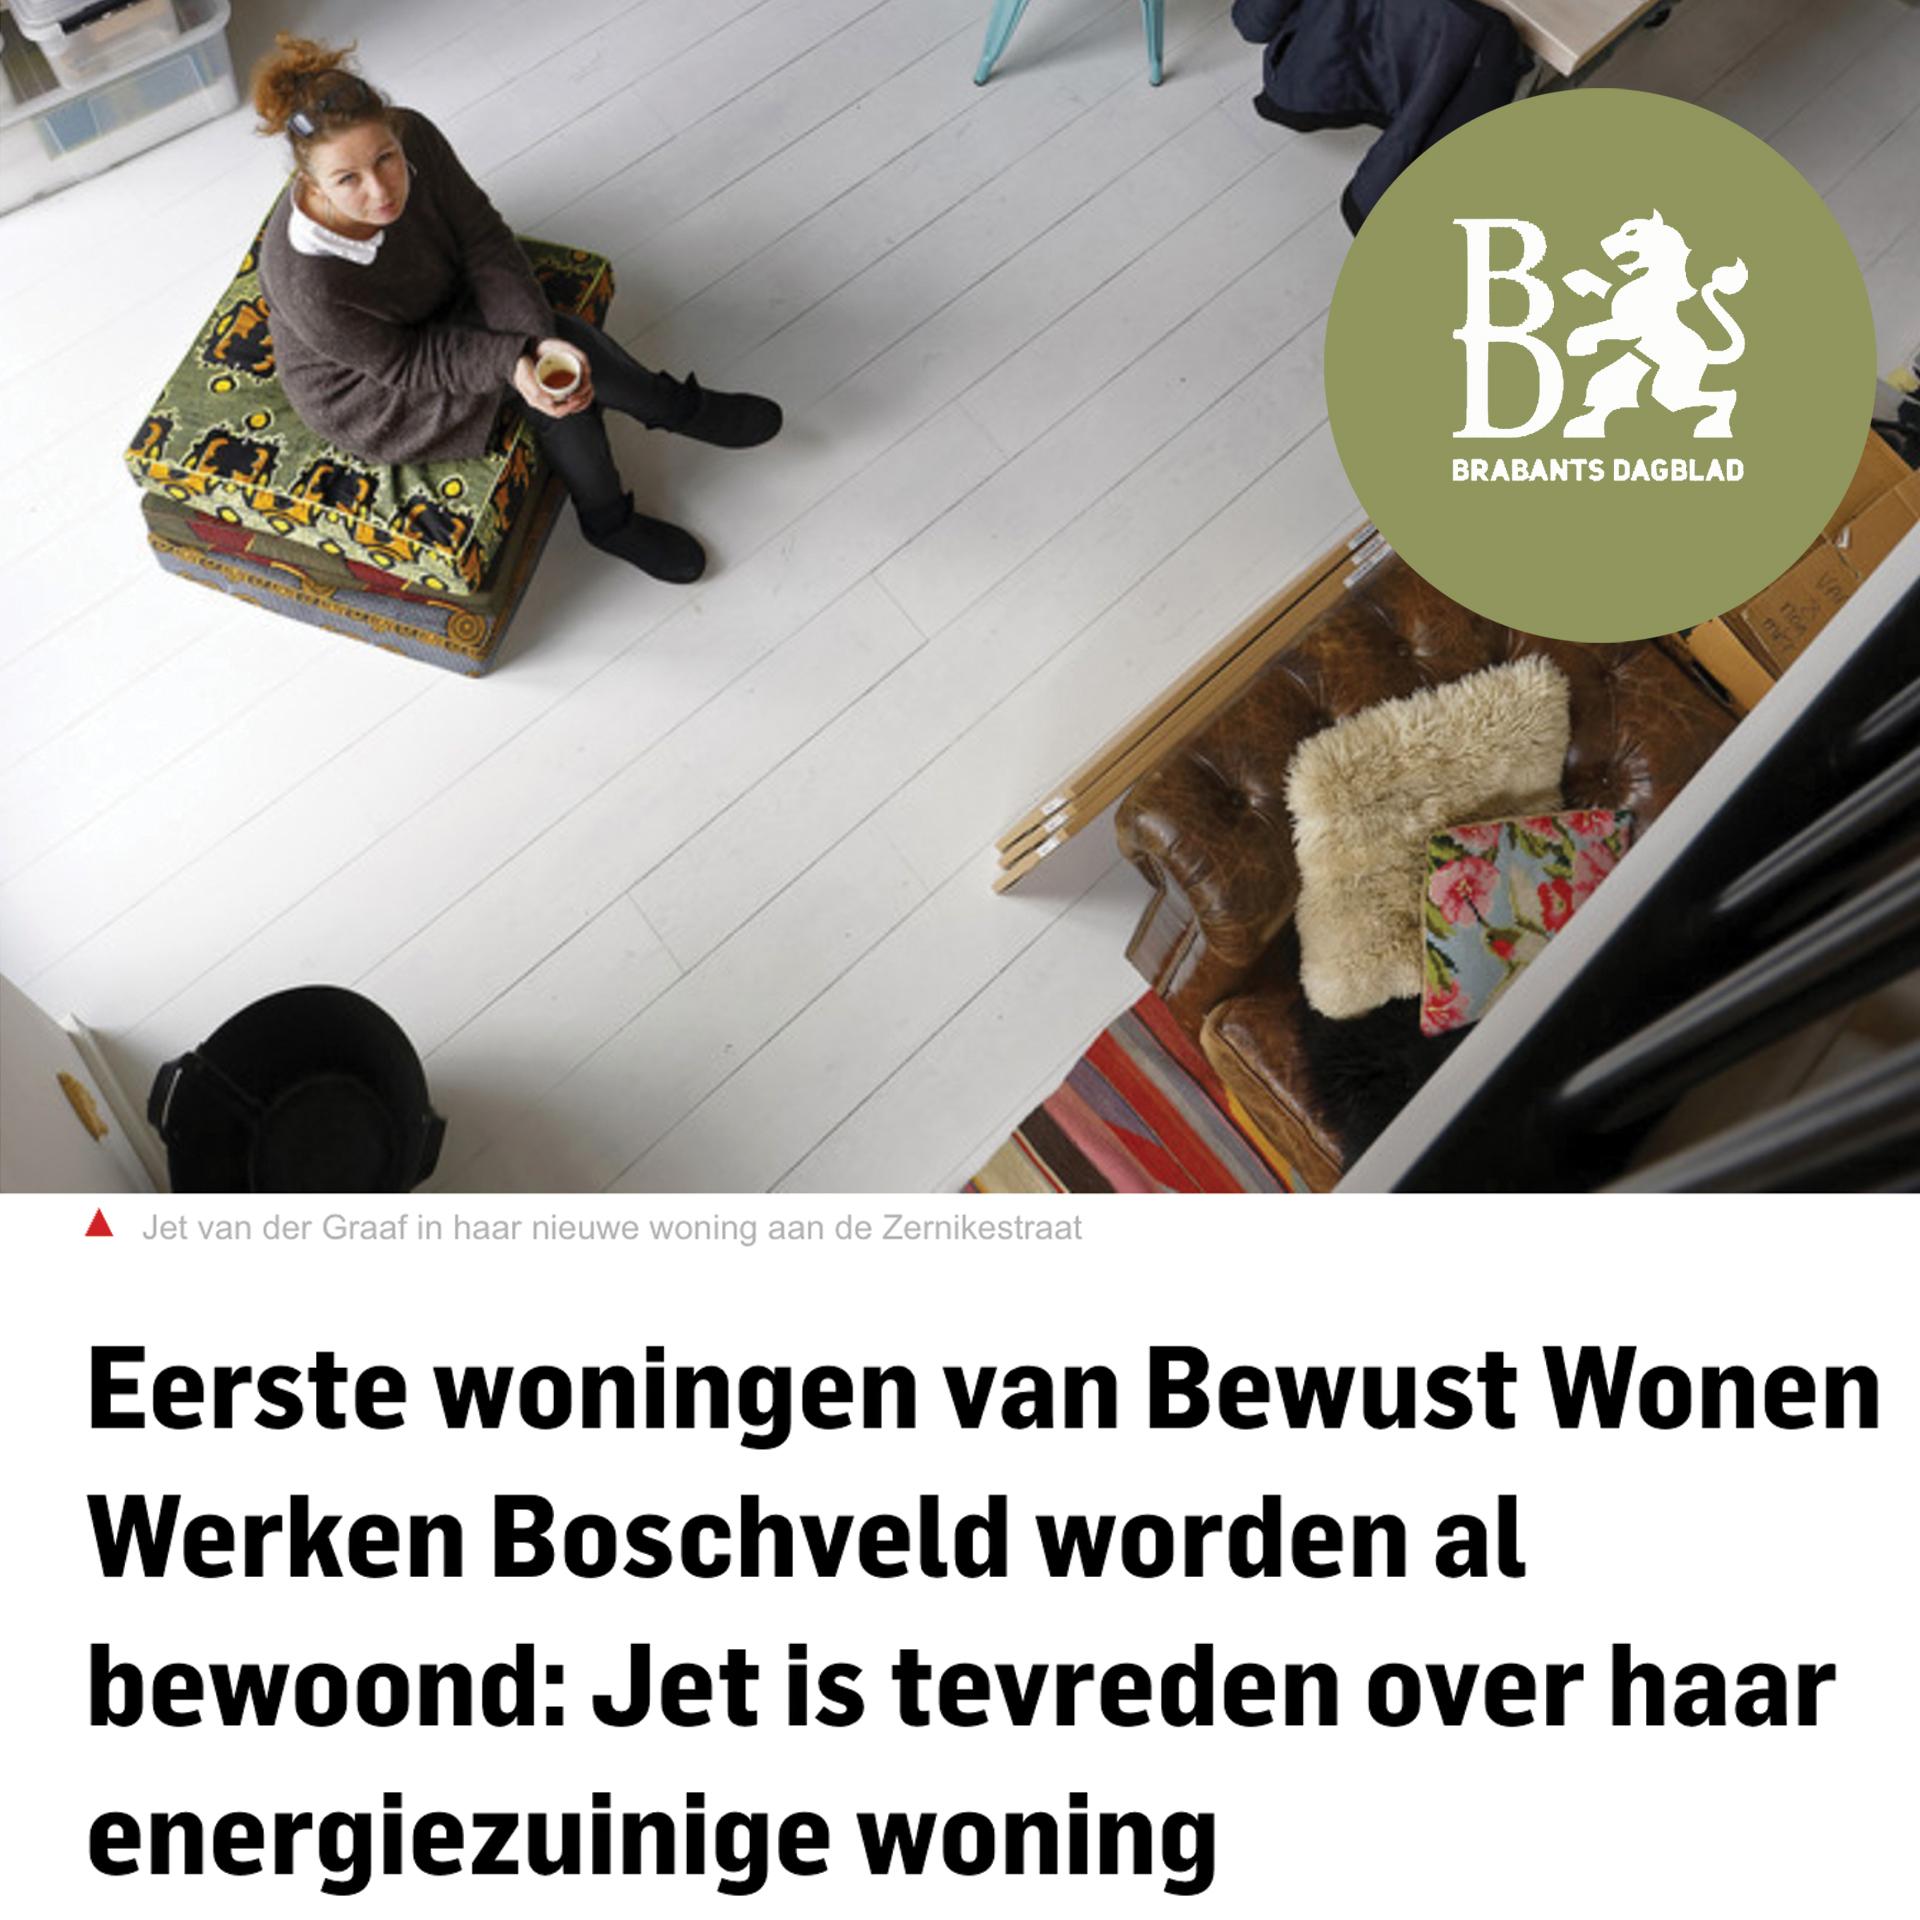 // interview Brabants Dagblad